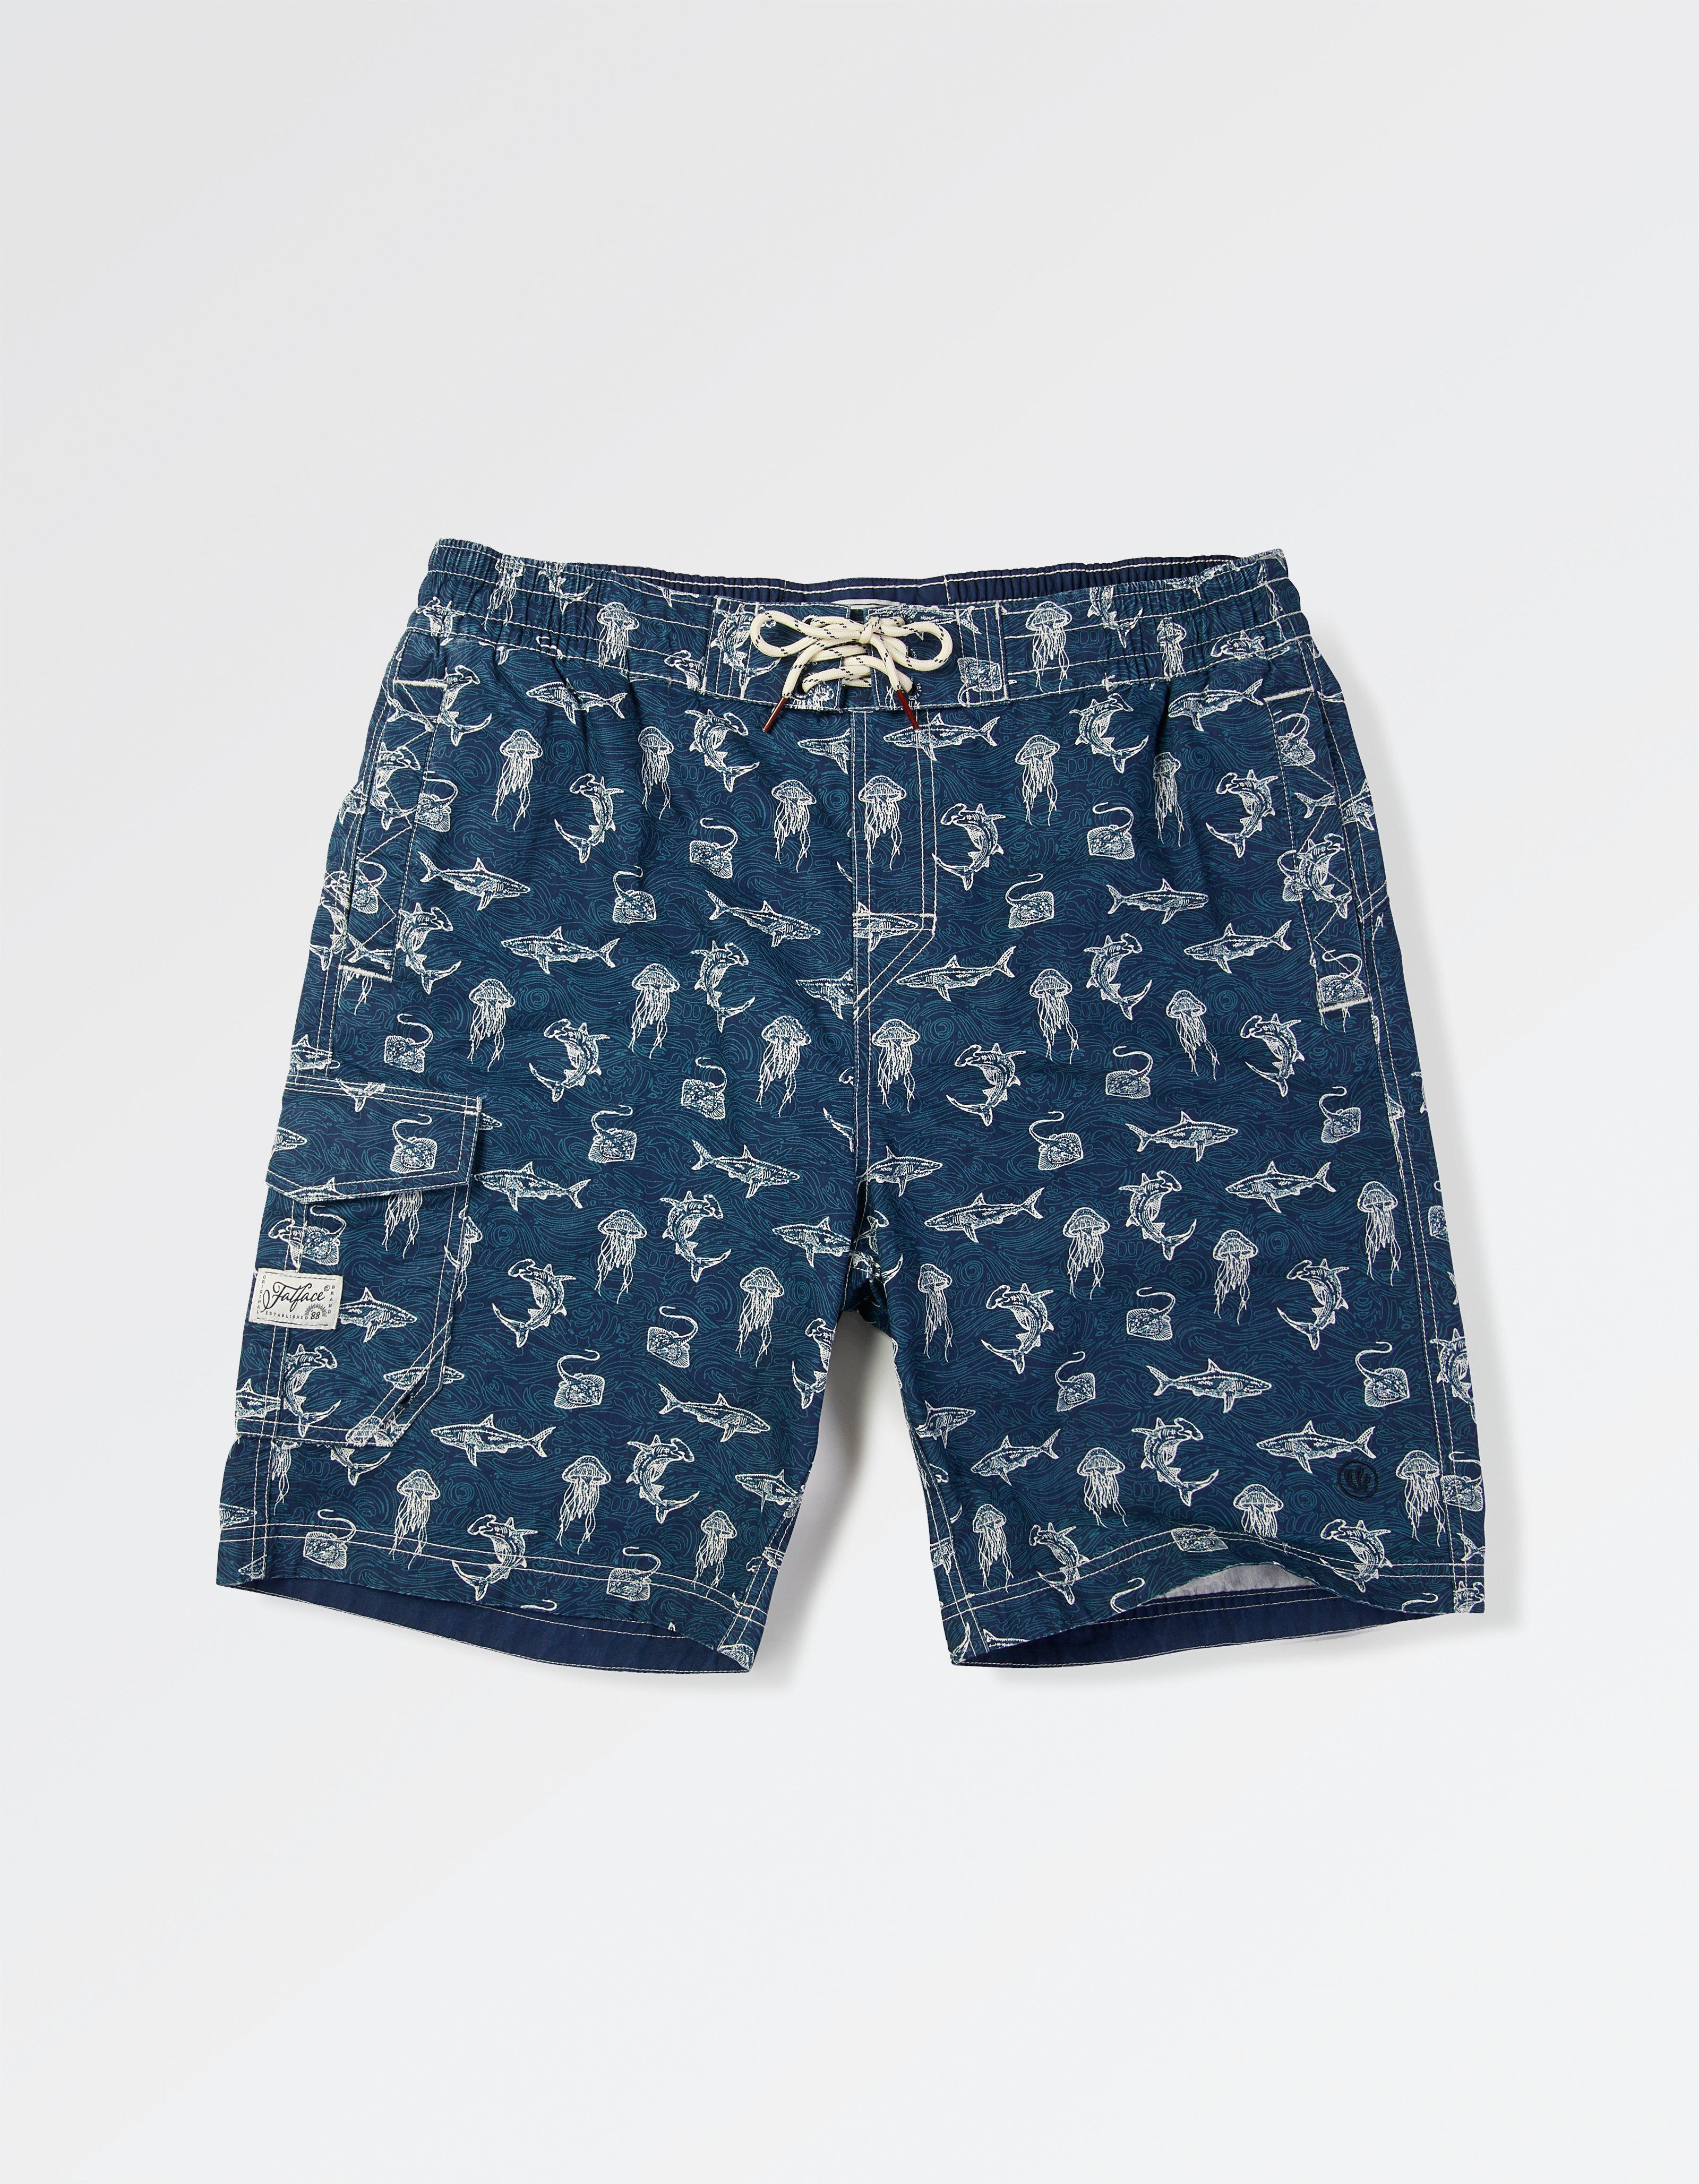 Reef Shark Print Deck Shorts